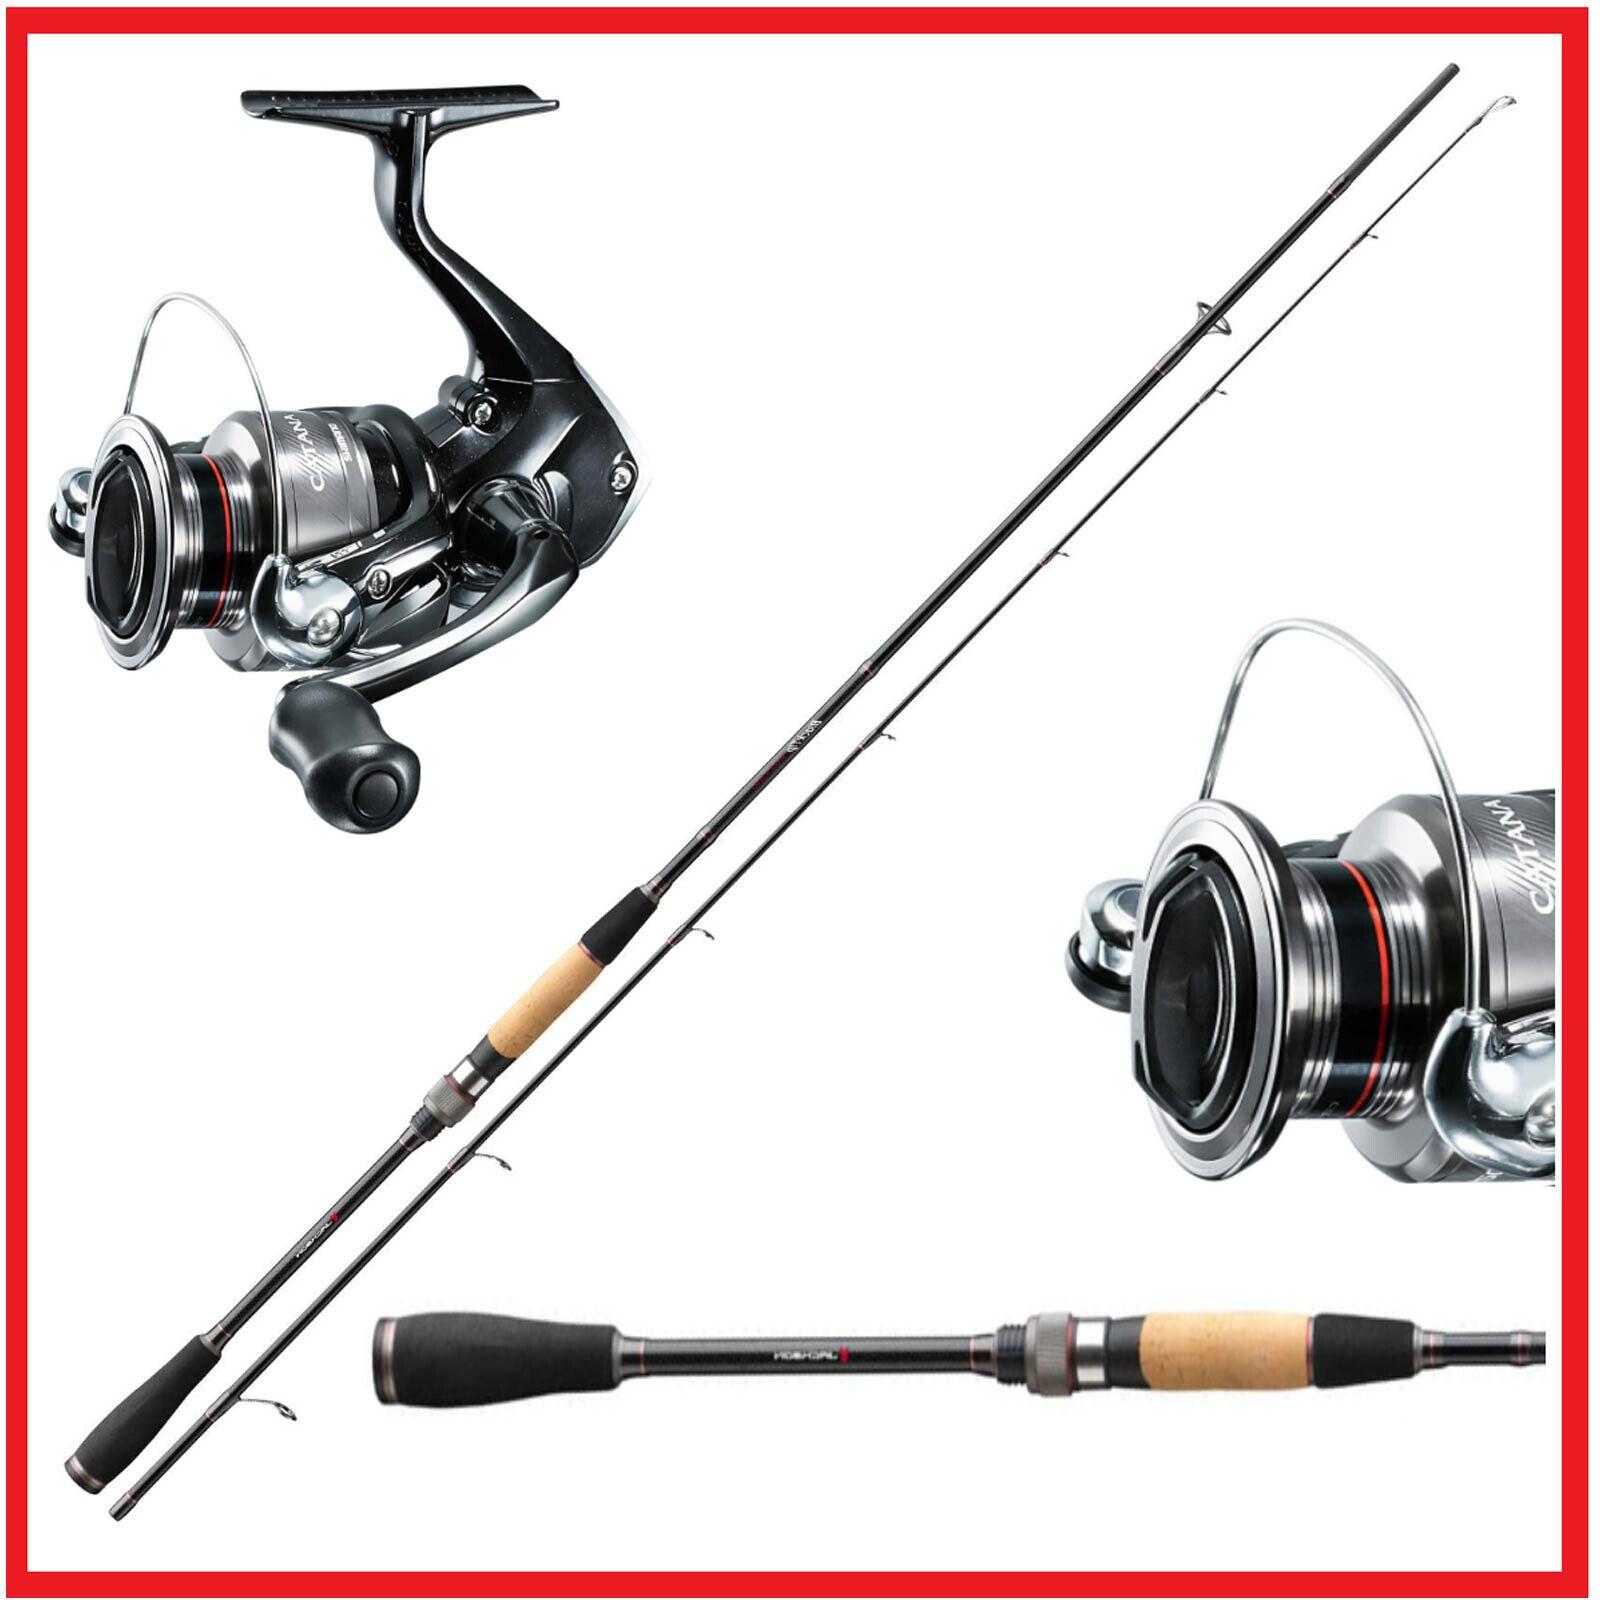 Prossoatore Completo Set Pesca Combinato  Jackson Spinning asta 2,70m & Shiuomoo